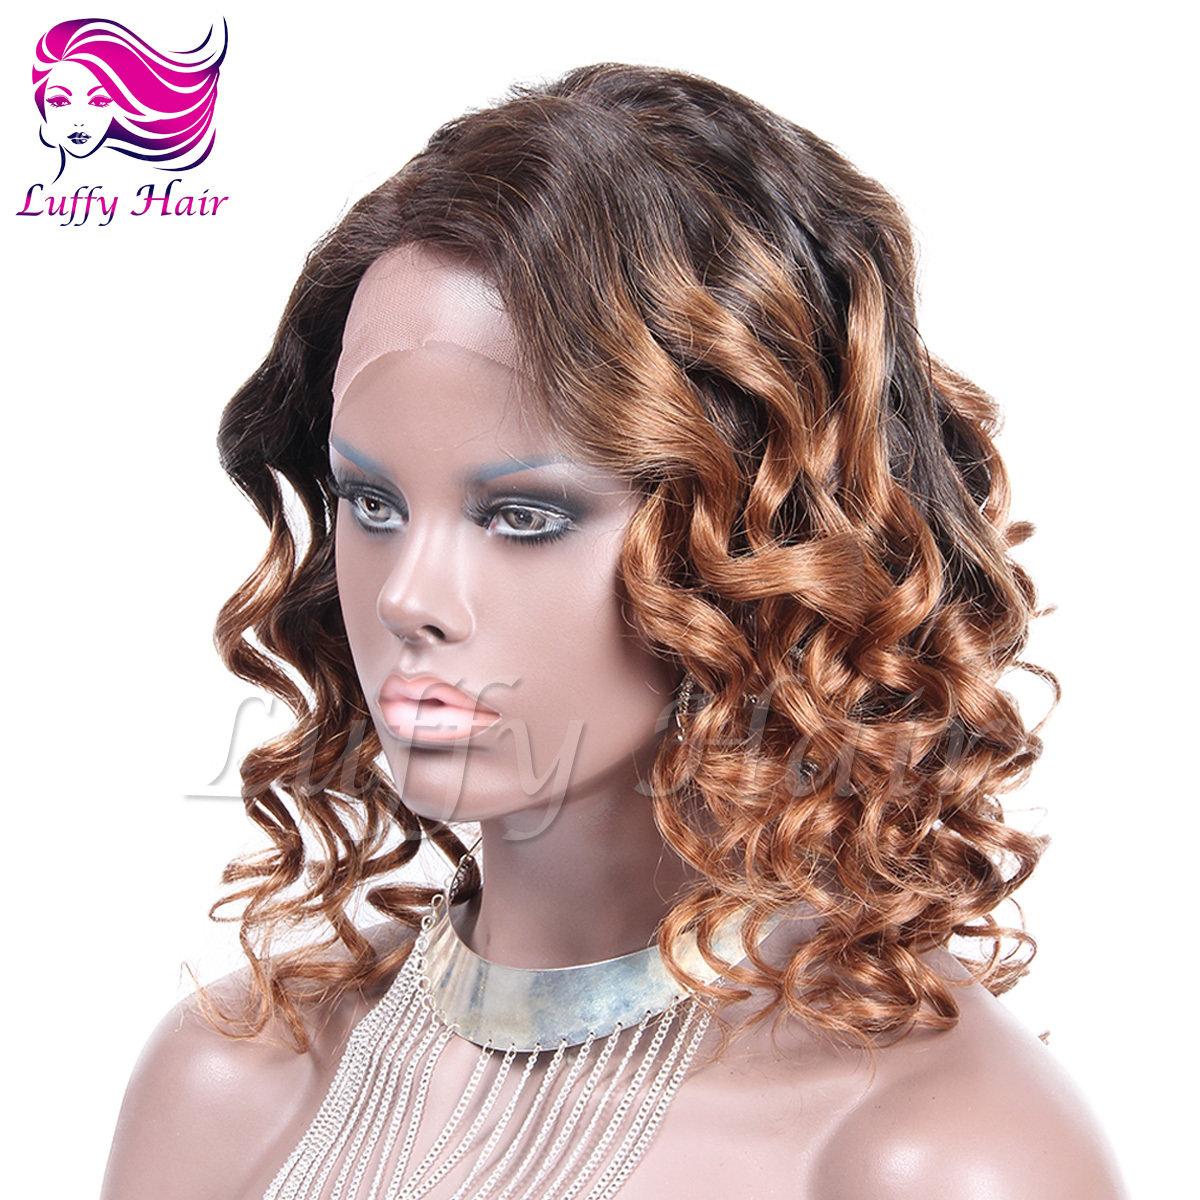 8A Virgin Human Hair #1B/#30 Body Wave Wig - KWL074